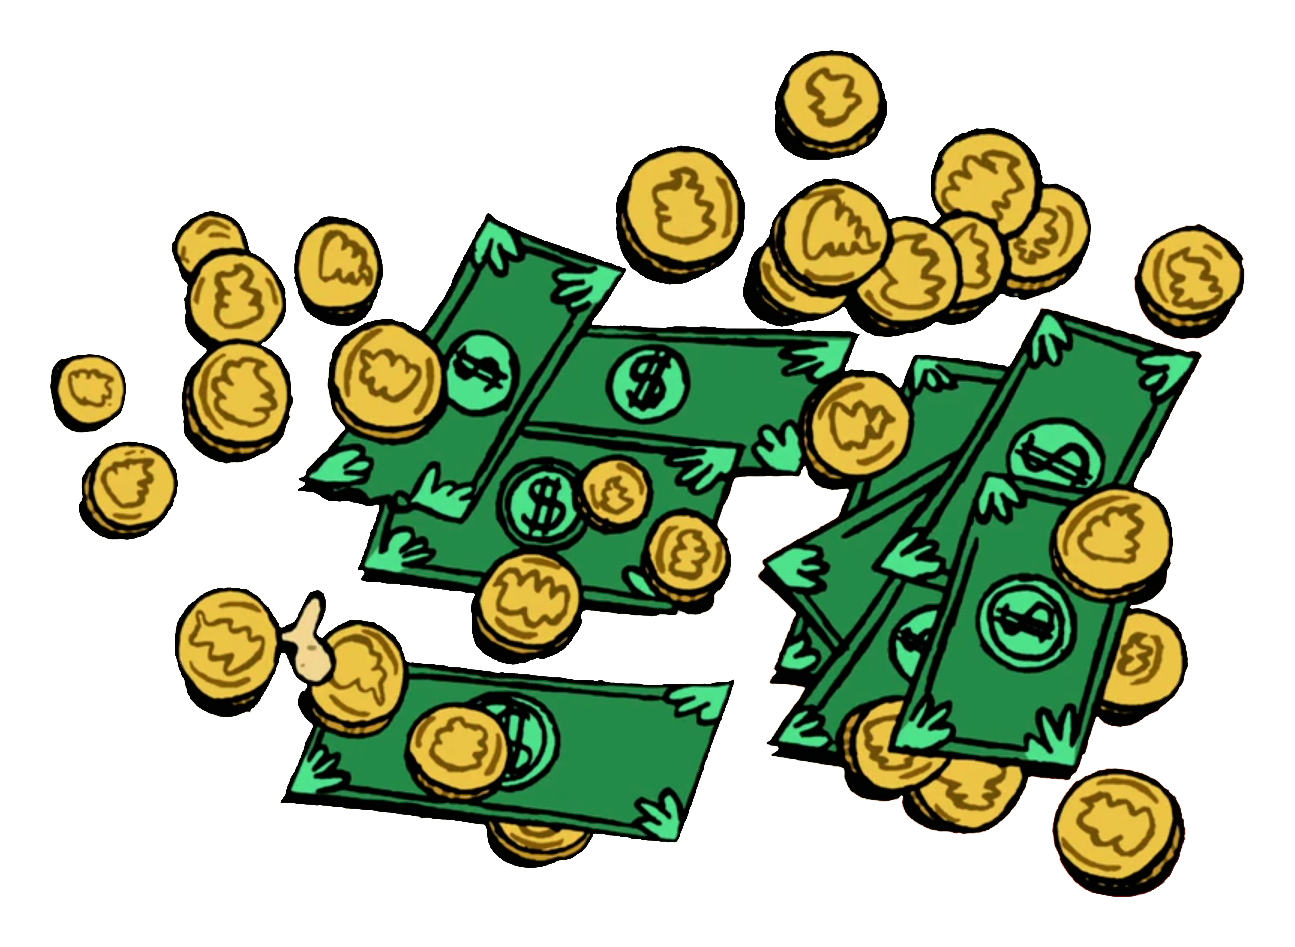 Money pile clipart jpg download Money | Chowder Fan Club | FANDOM powered by Wikia jpg download